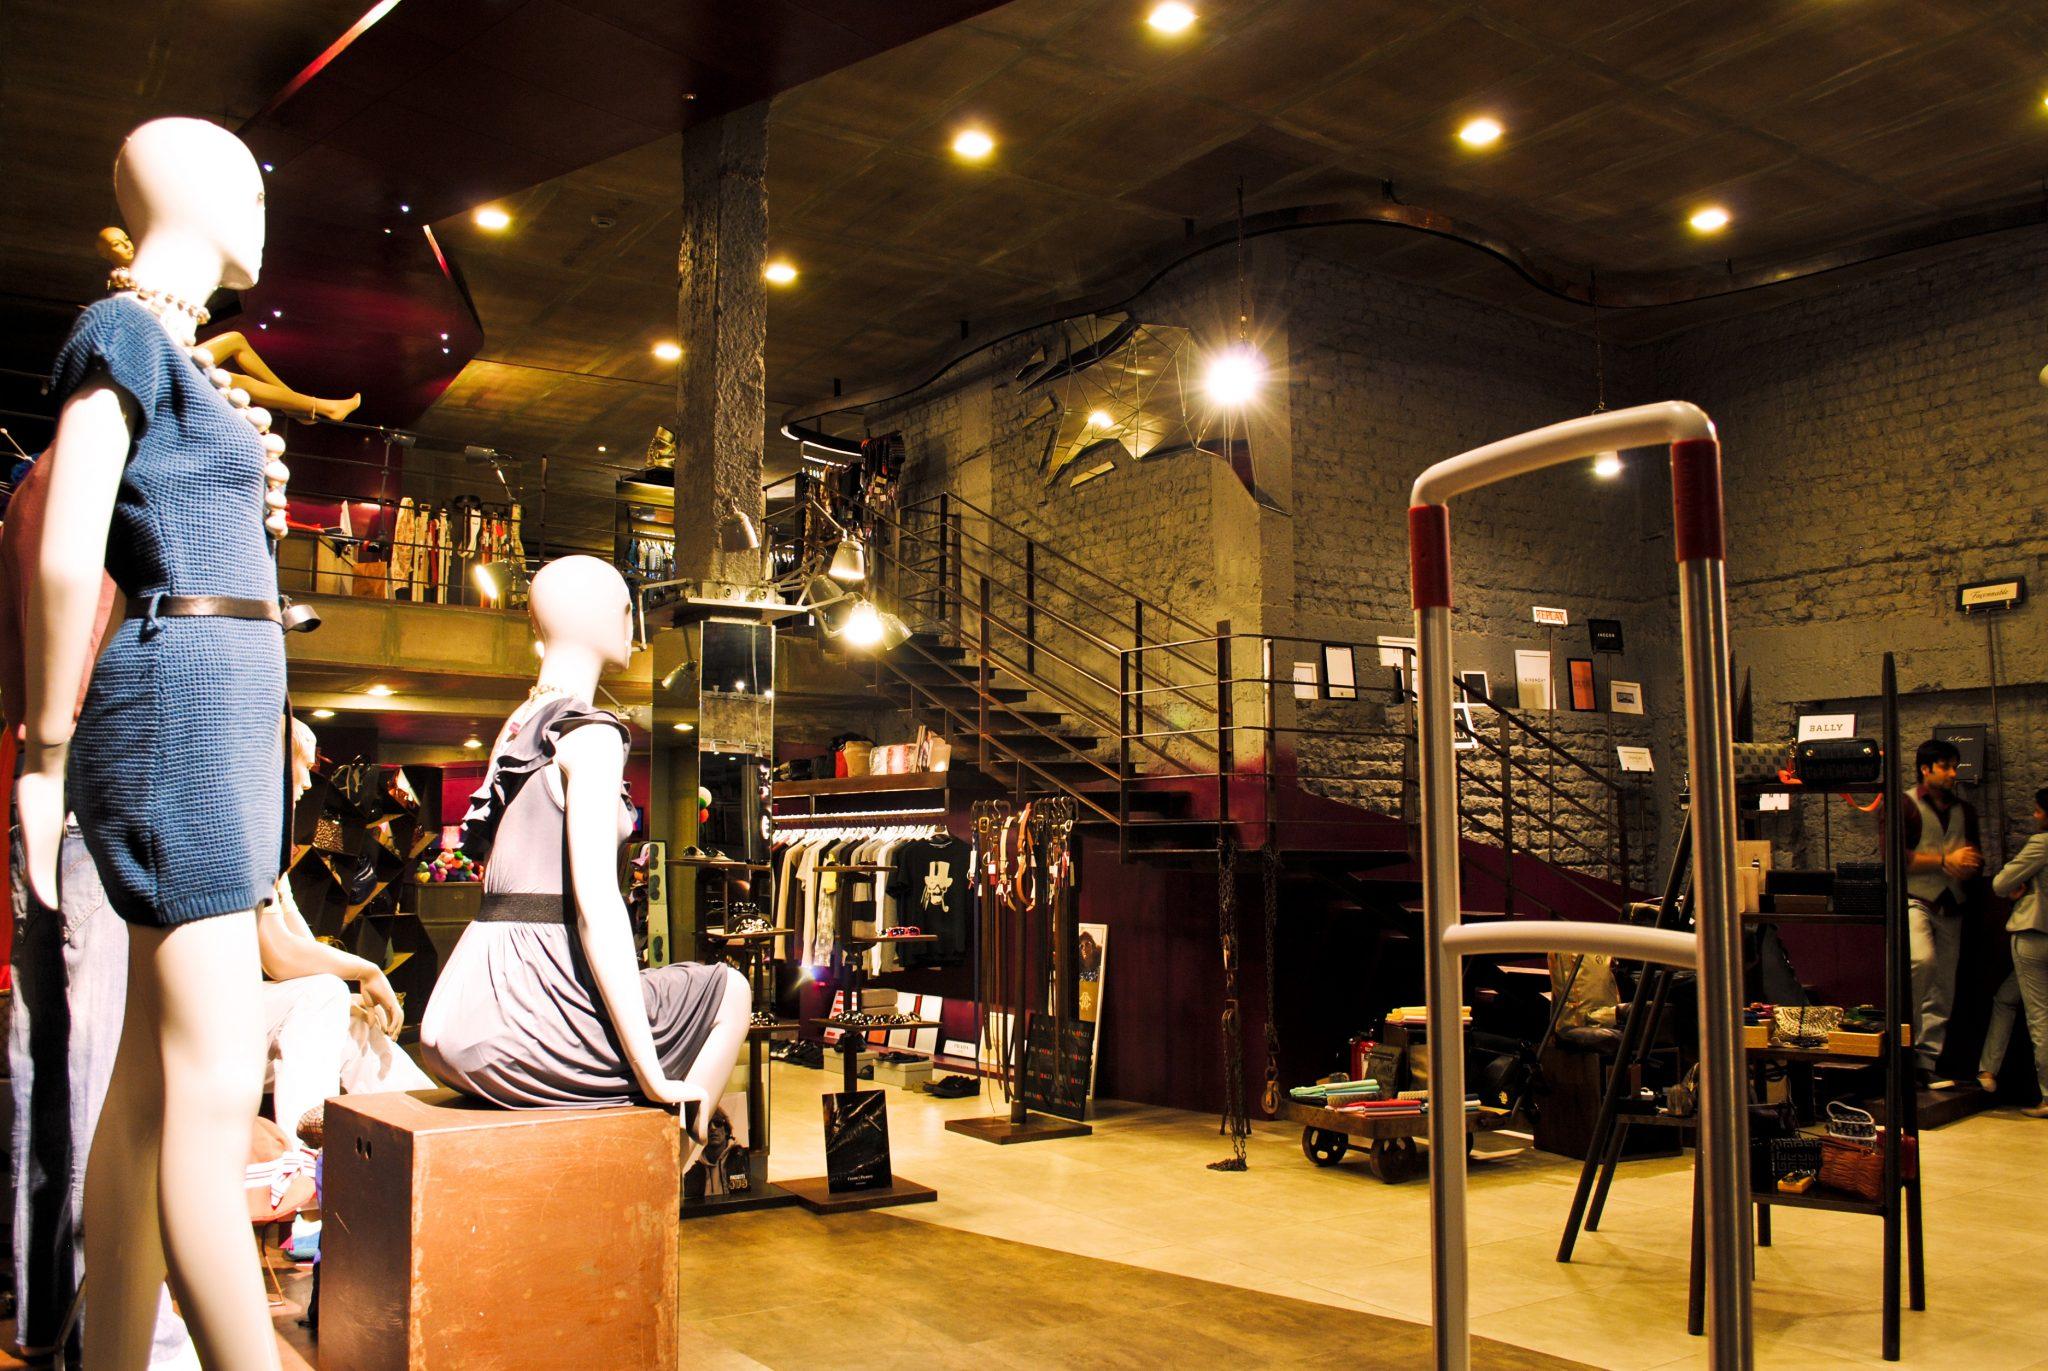 Top 10 Fashion Store In Kenya – Nairobi fashion hub